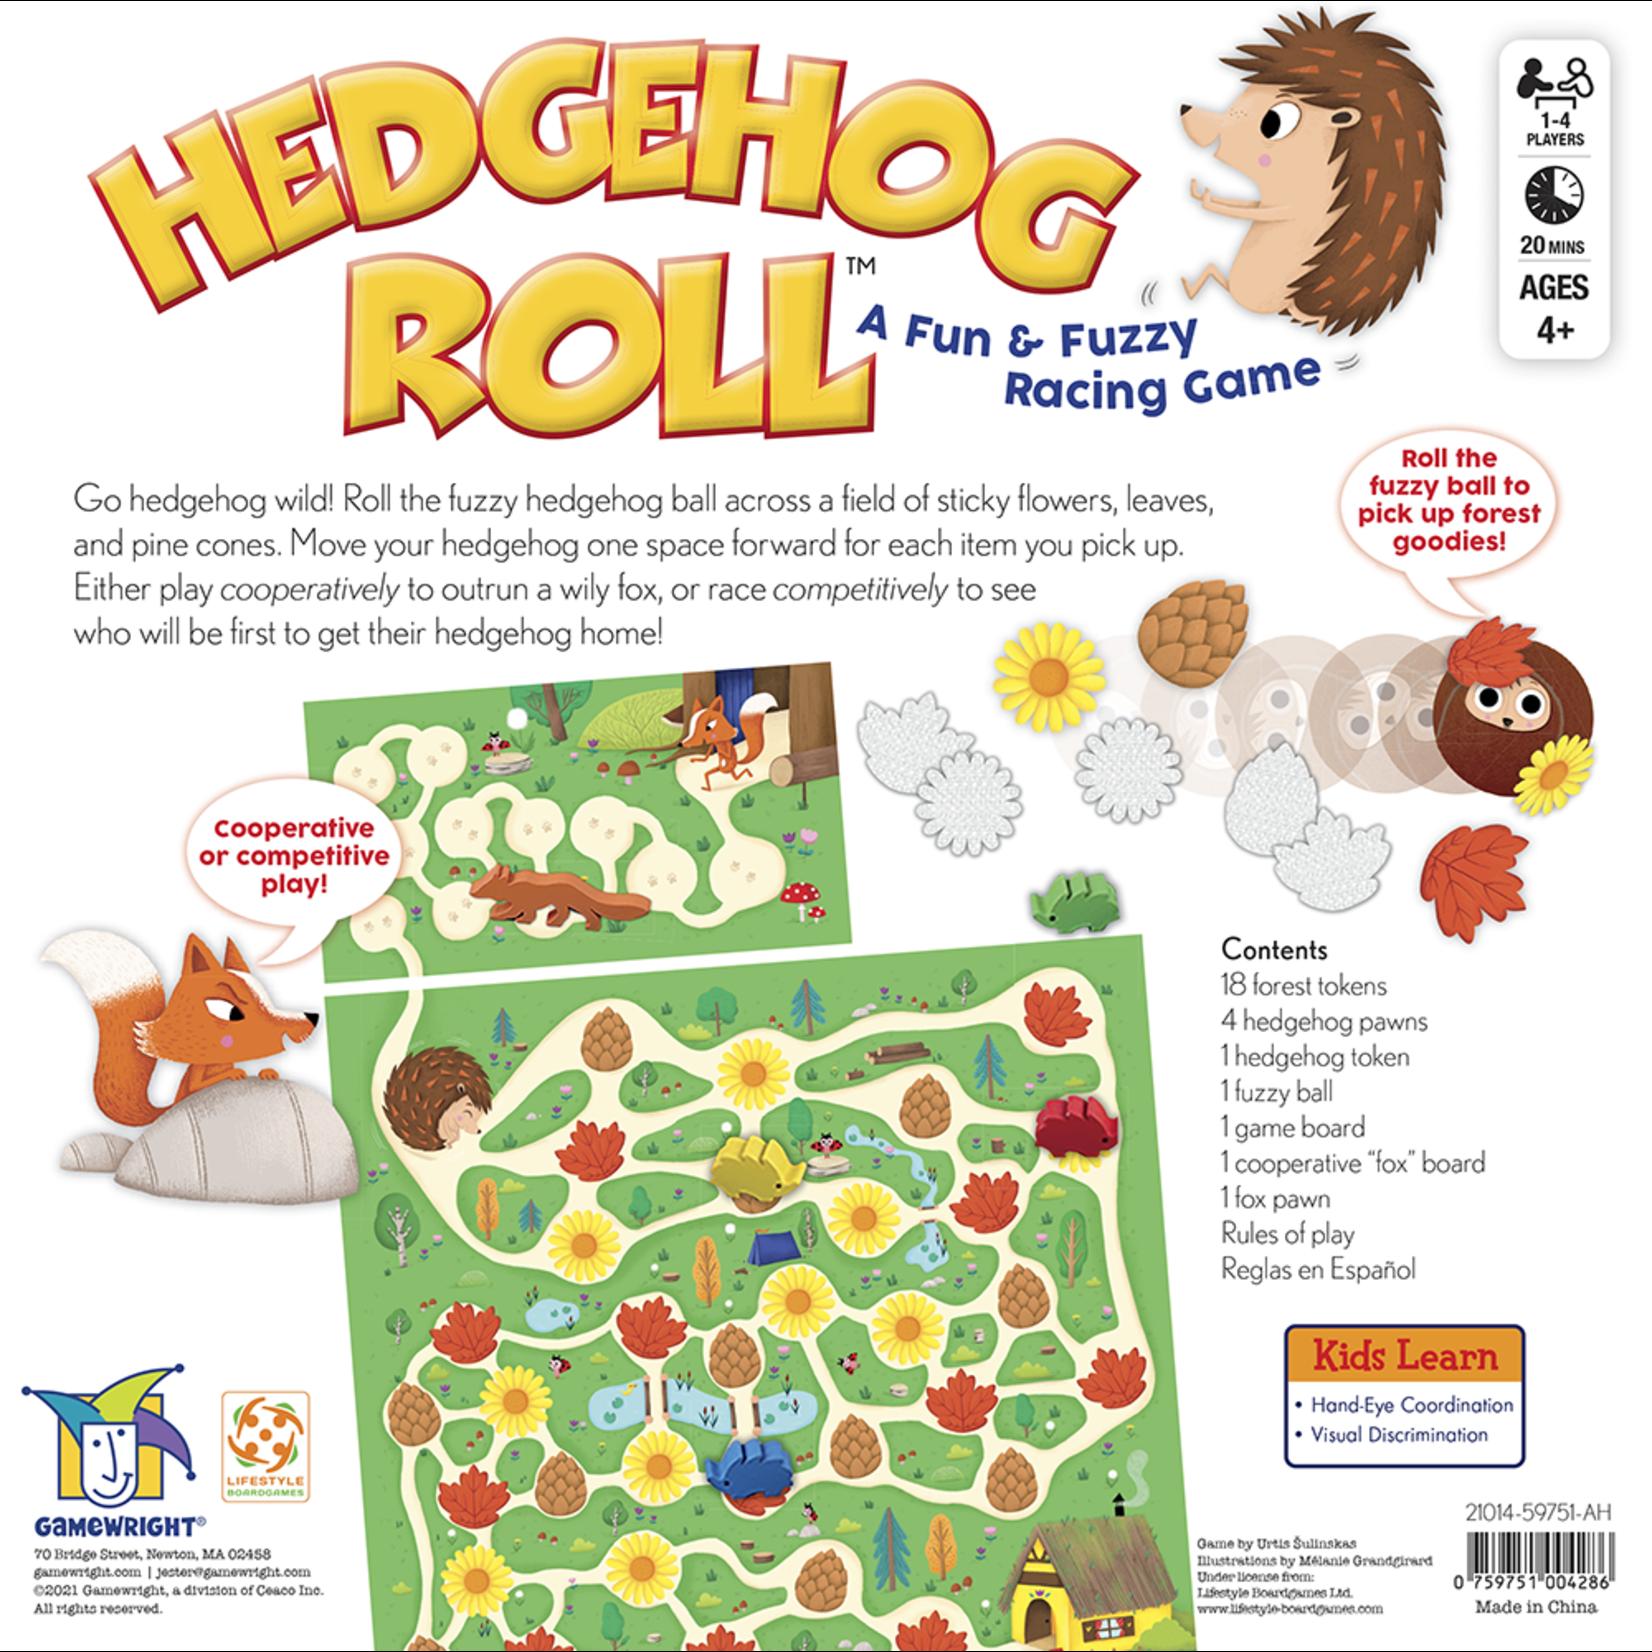 Gamewright Hedgehog Roll: A Fun & Fuzzy Racing Game